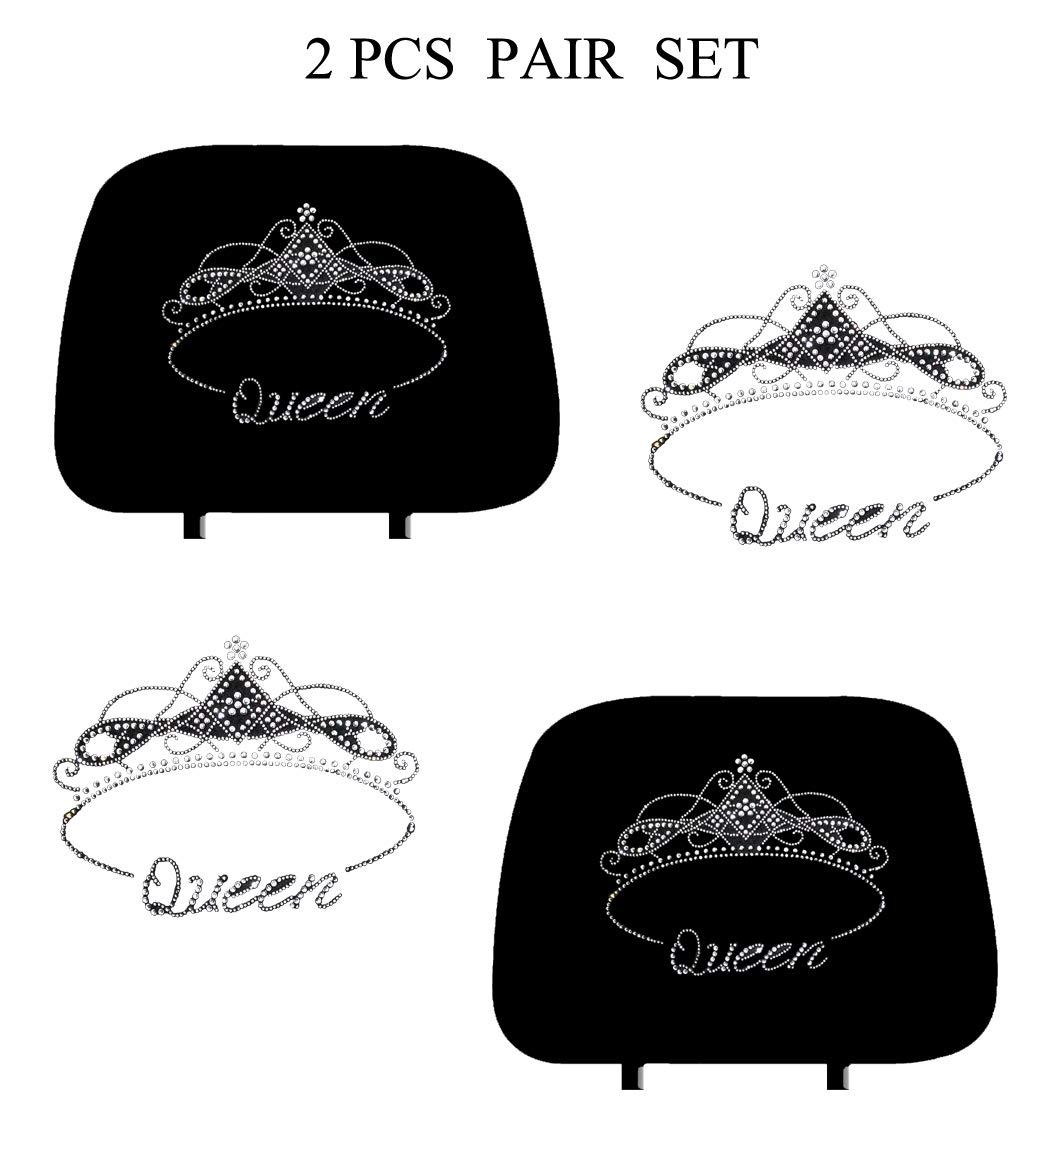 CarsCover Royal Queen Crown Crystal Diamond Bling Rhinestone Studded Carpet Car SUV Truck Floor Mats 4 PCS